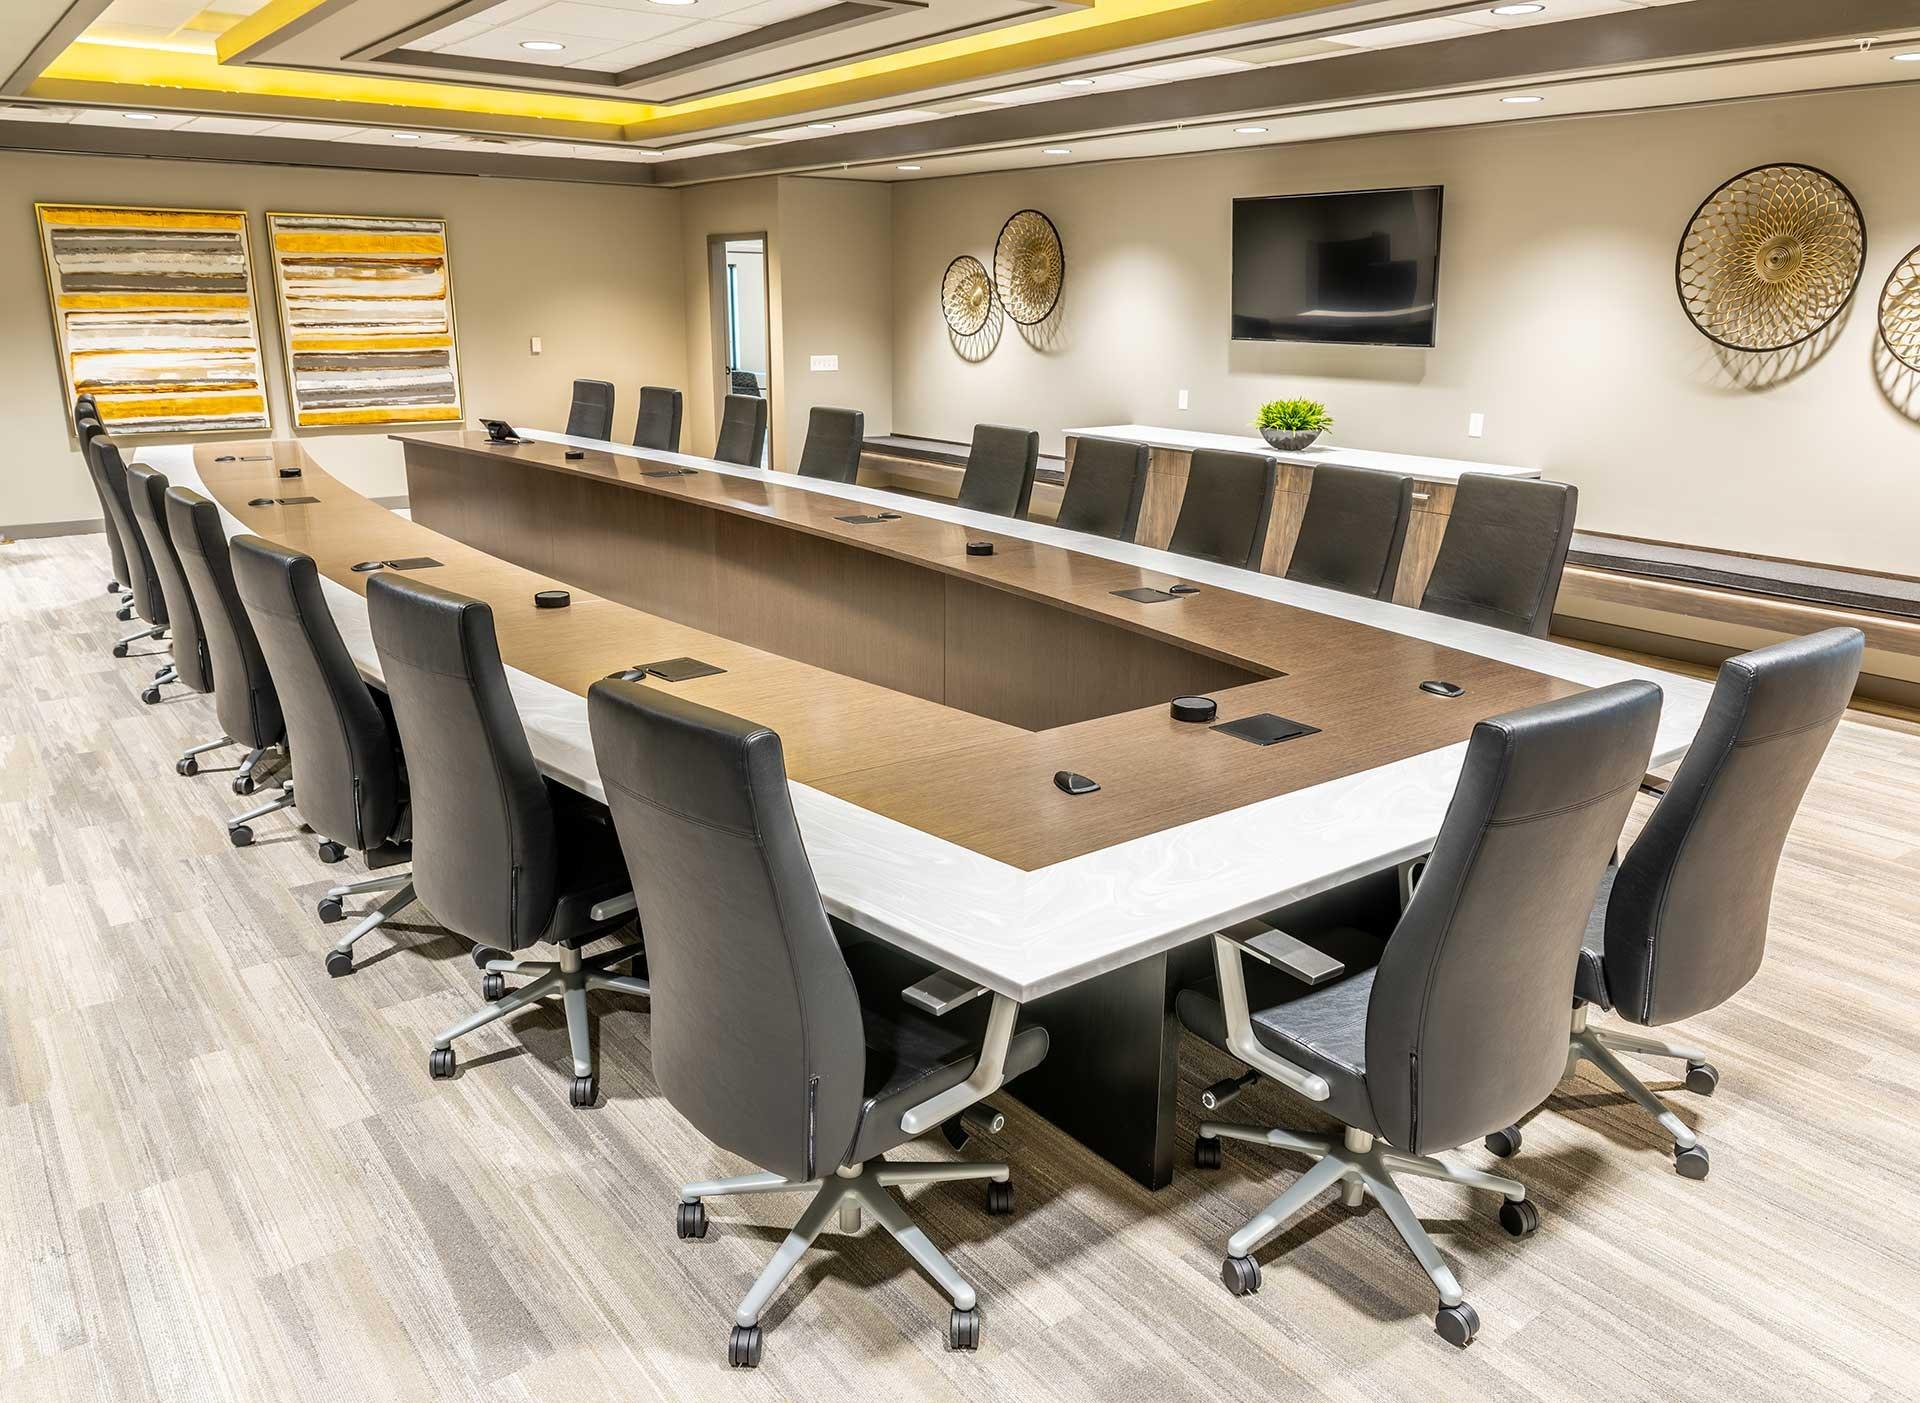 KYMEA conference room